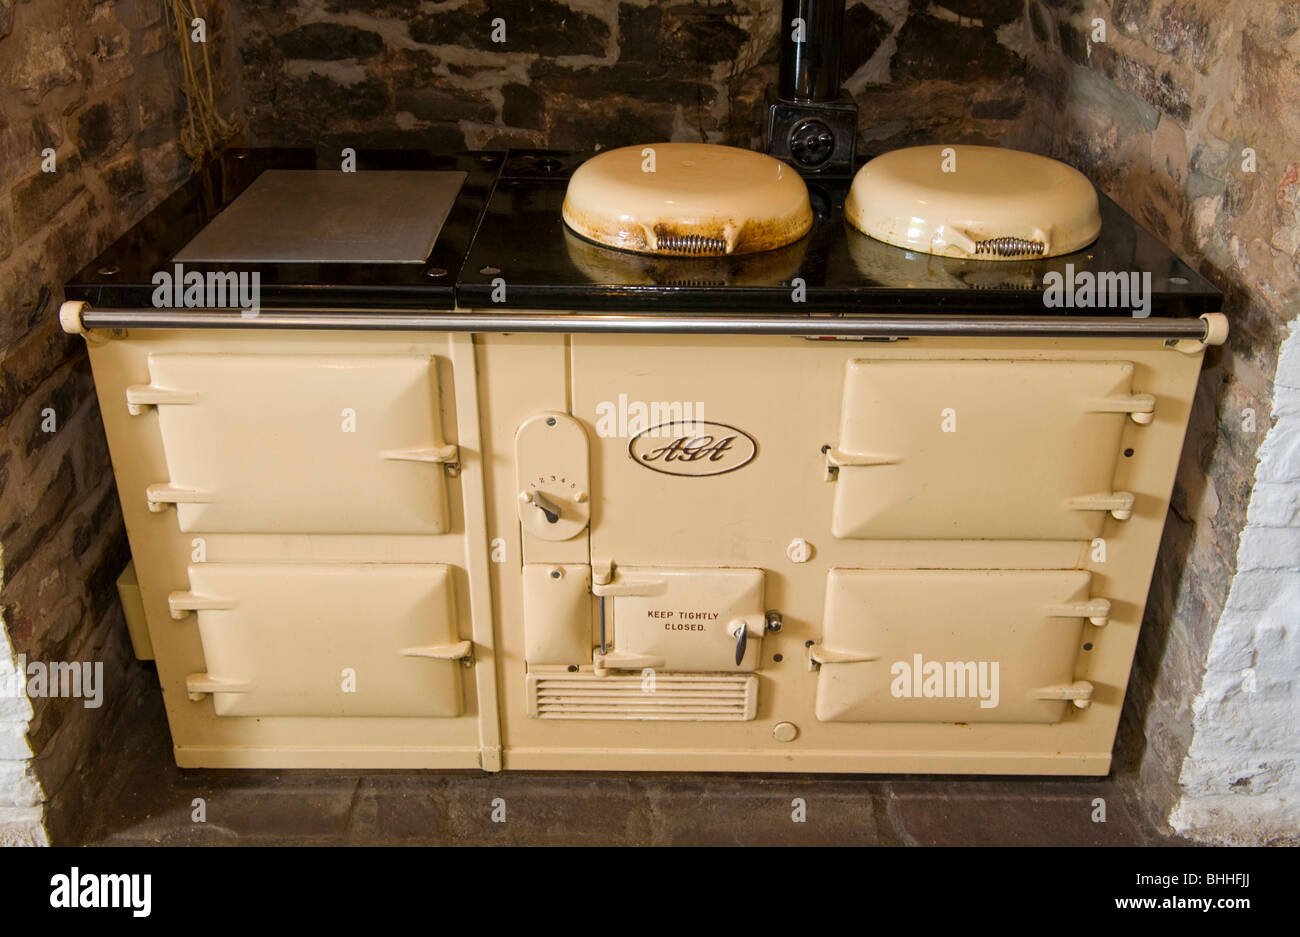 AGA cooker at The Felin Fach Griffin restaurant, near Brecon, Powys